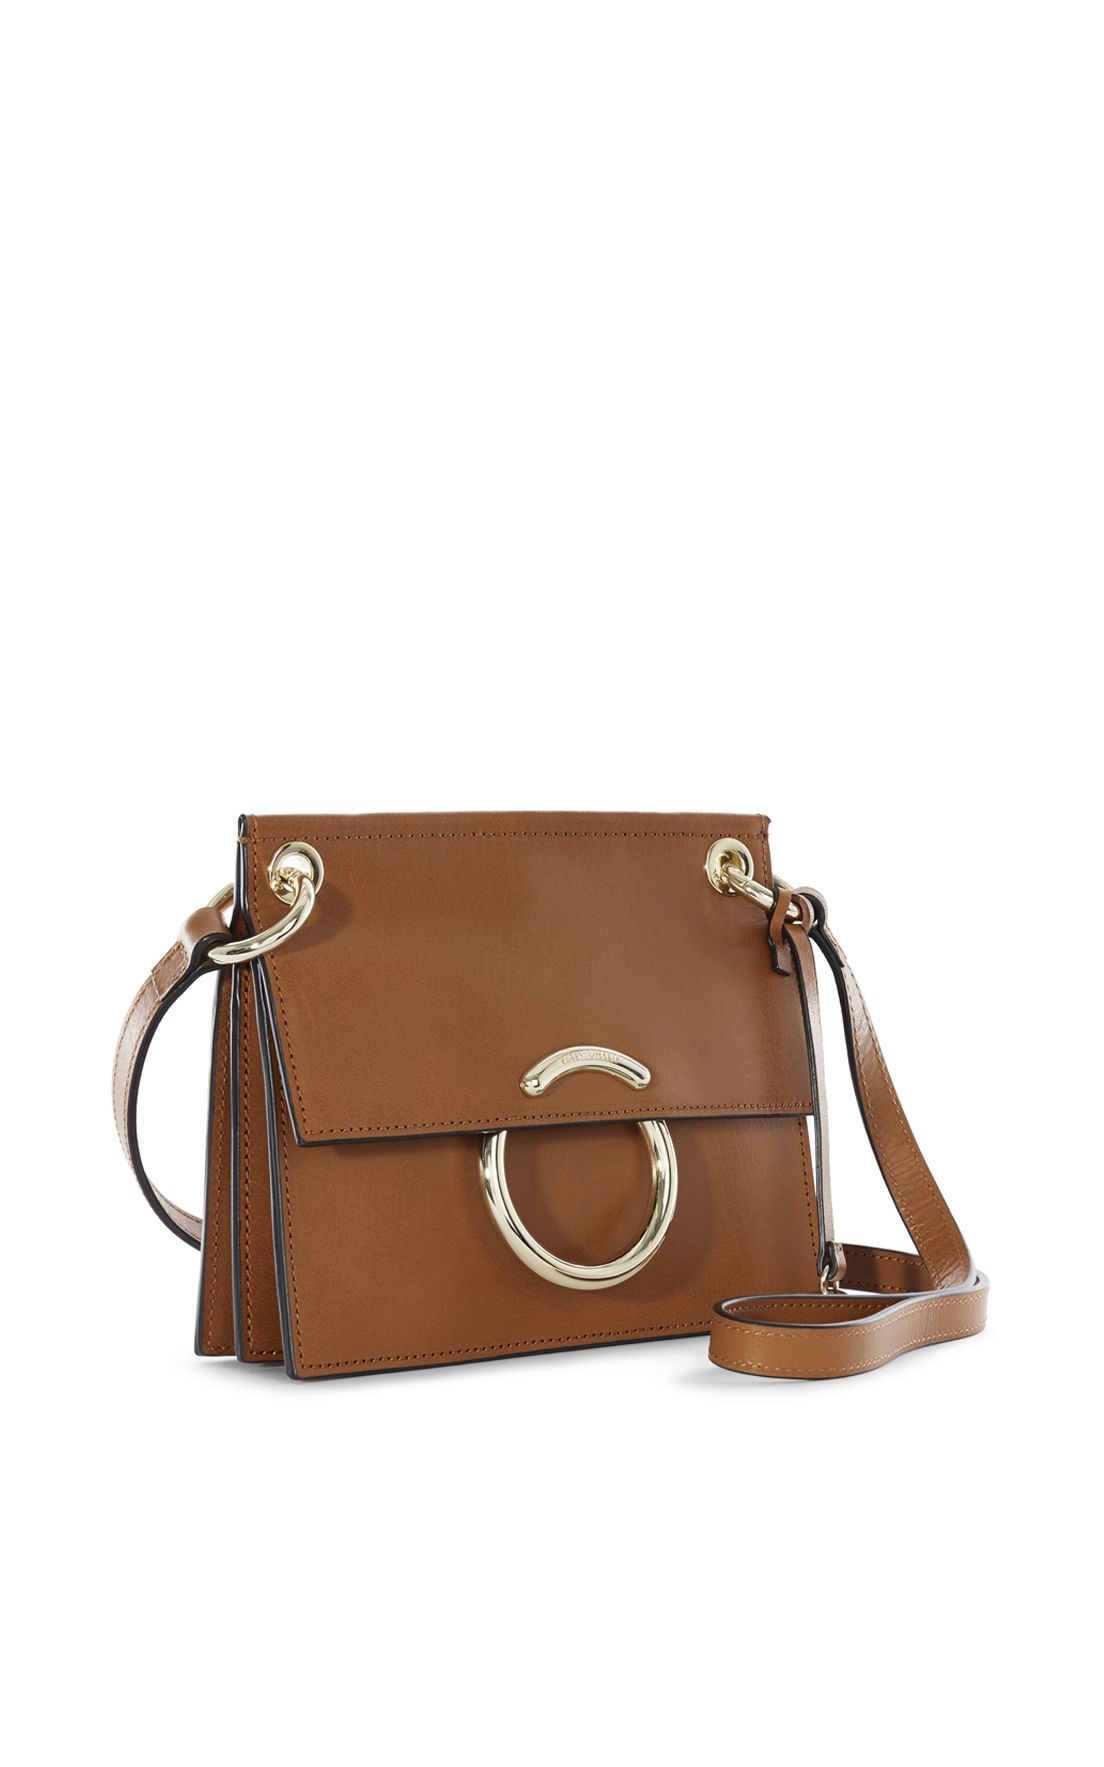 feb0a2dce5e4 Karen Millen, Small Leather O-ring Satchel Tan | Замша | Bags ...